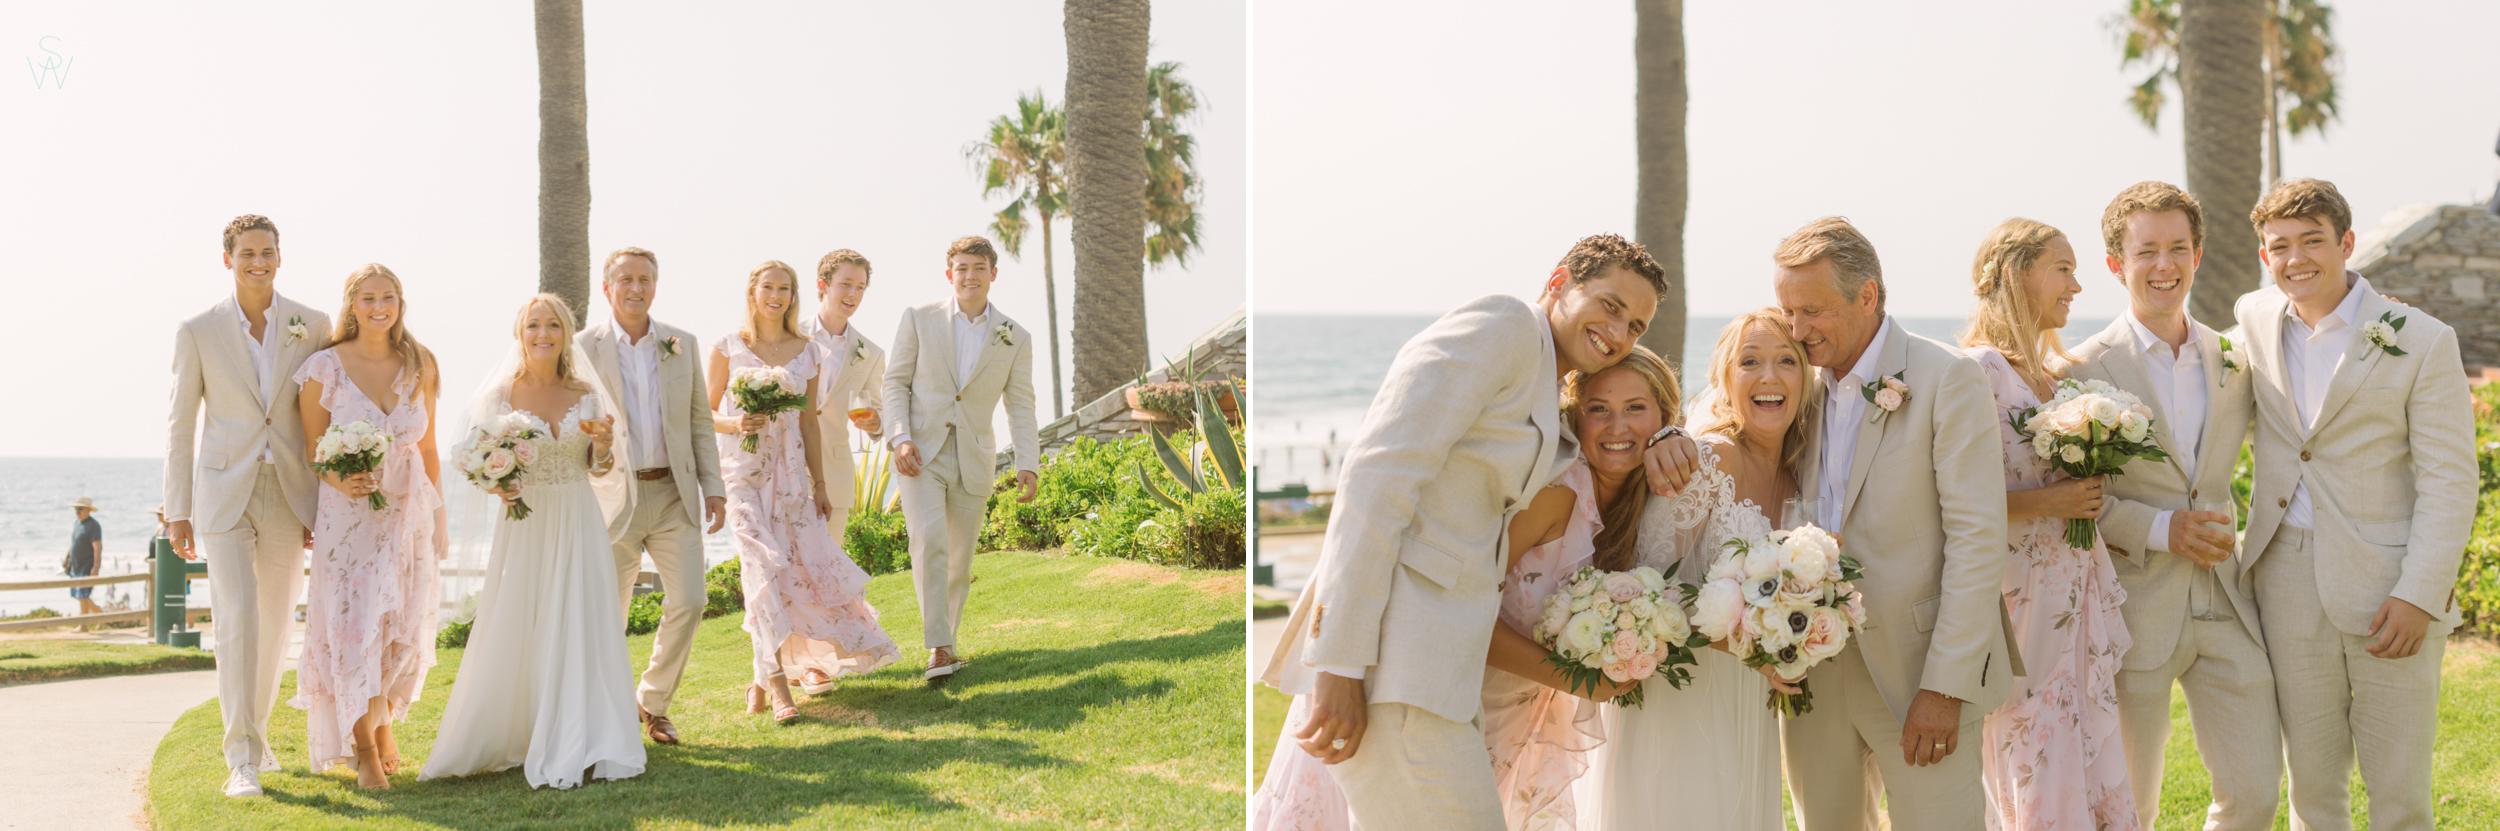 125DEL.MAR.WEDDINGS.photography.shewanders.JPG